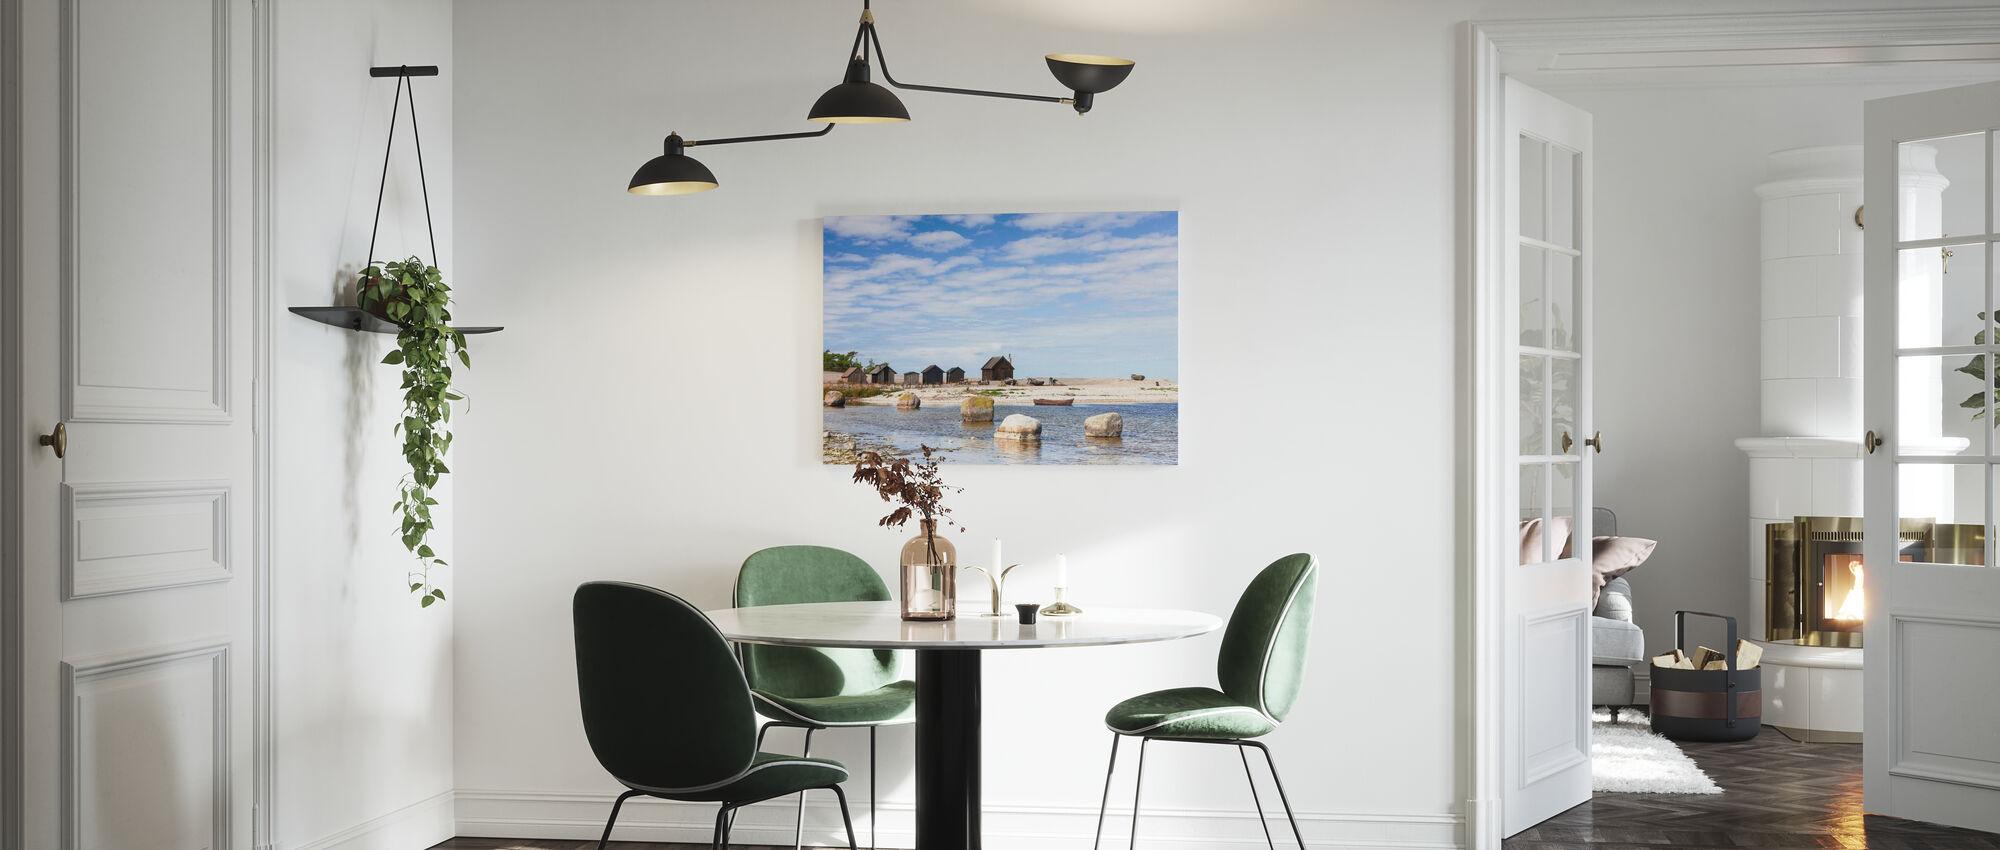 Old Fishing Huts - Canvas print - Kitchen